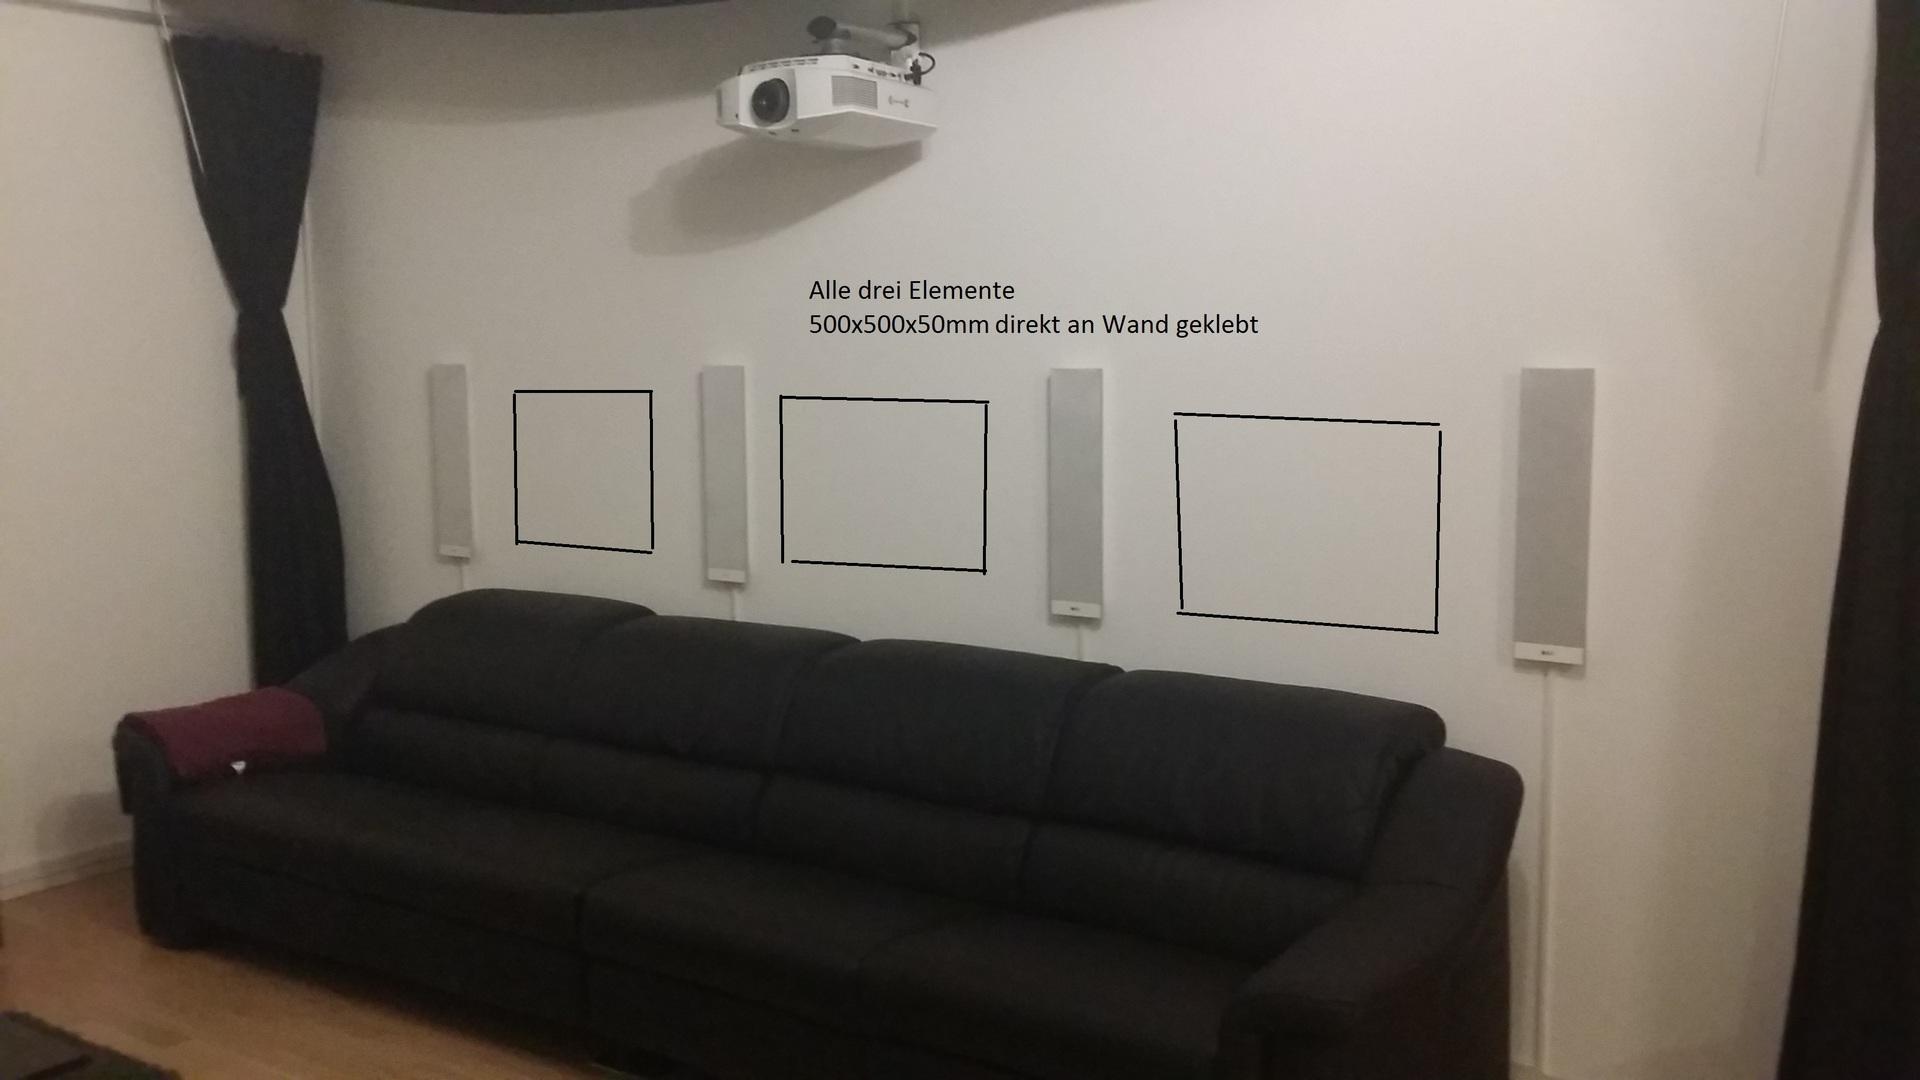 wohnzimmer k che akustik basotect hall heimkino k che wohnzimmer hifi. Black Bedroom Furniture Sets. Home Design Ideas